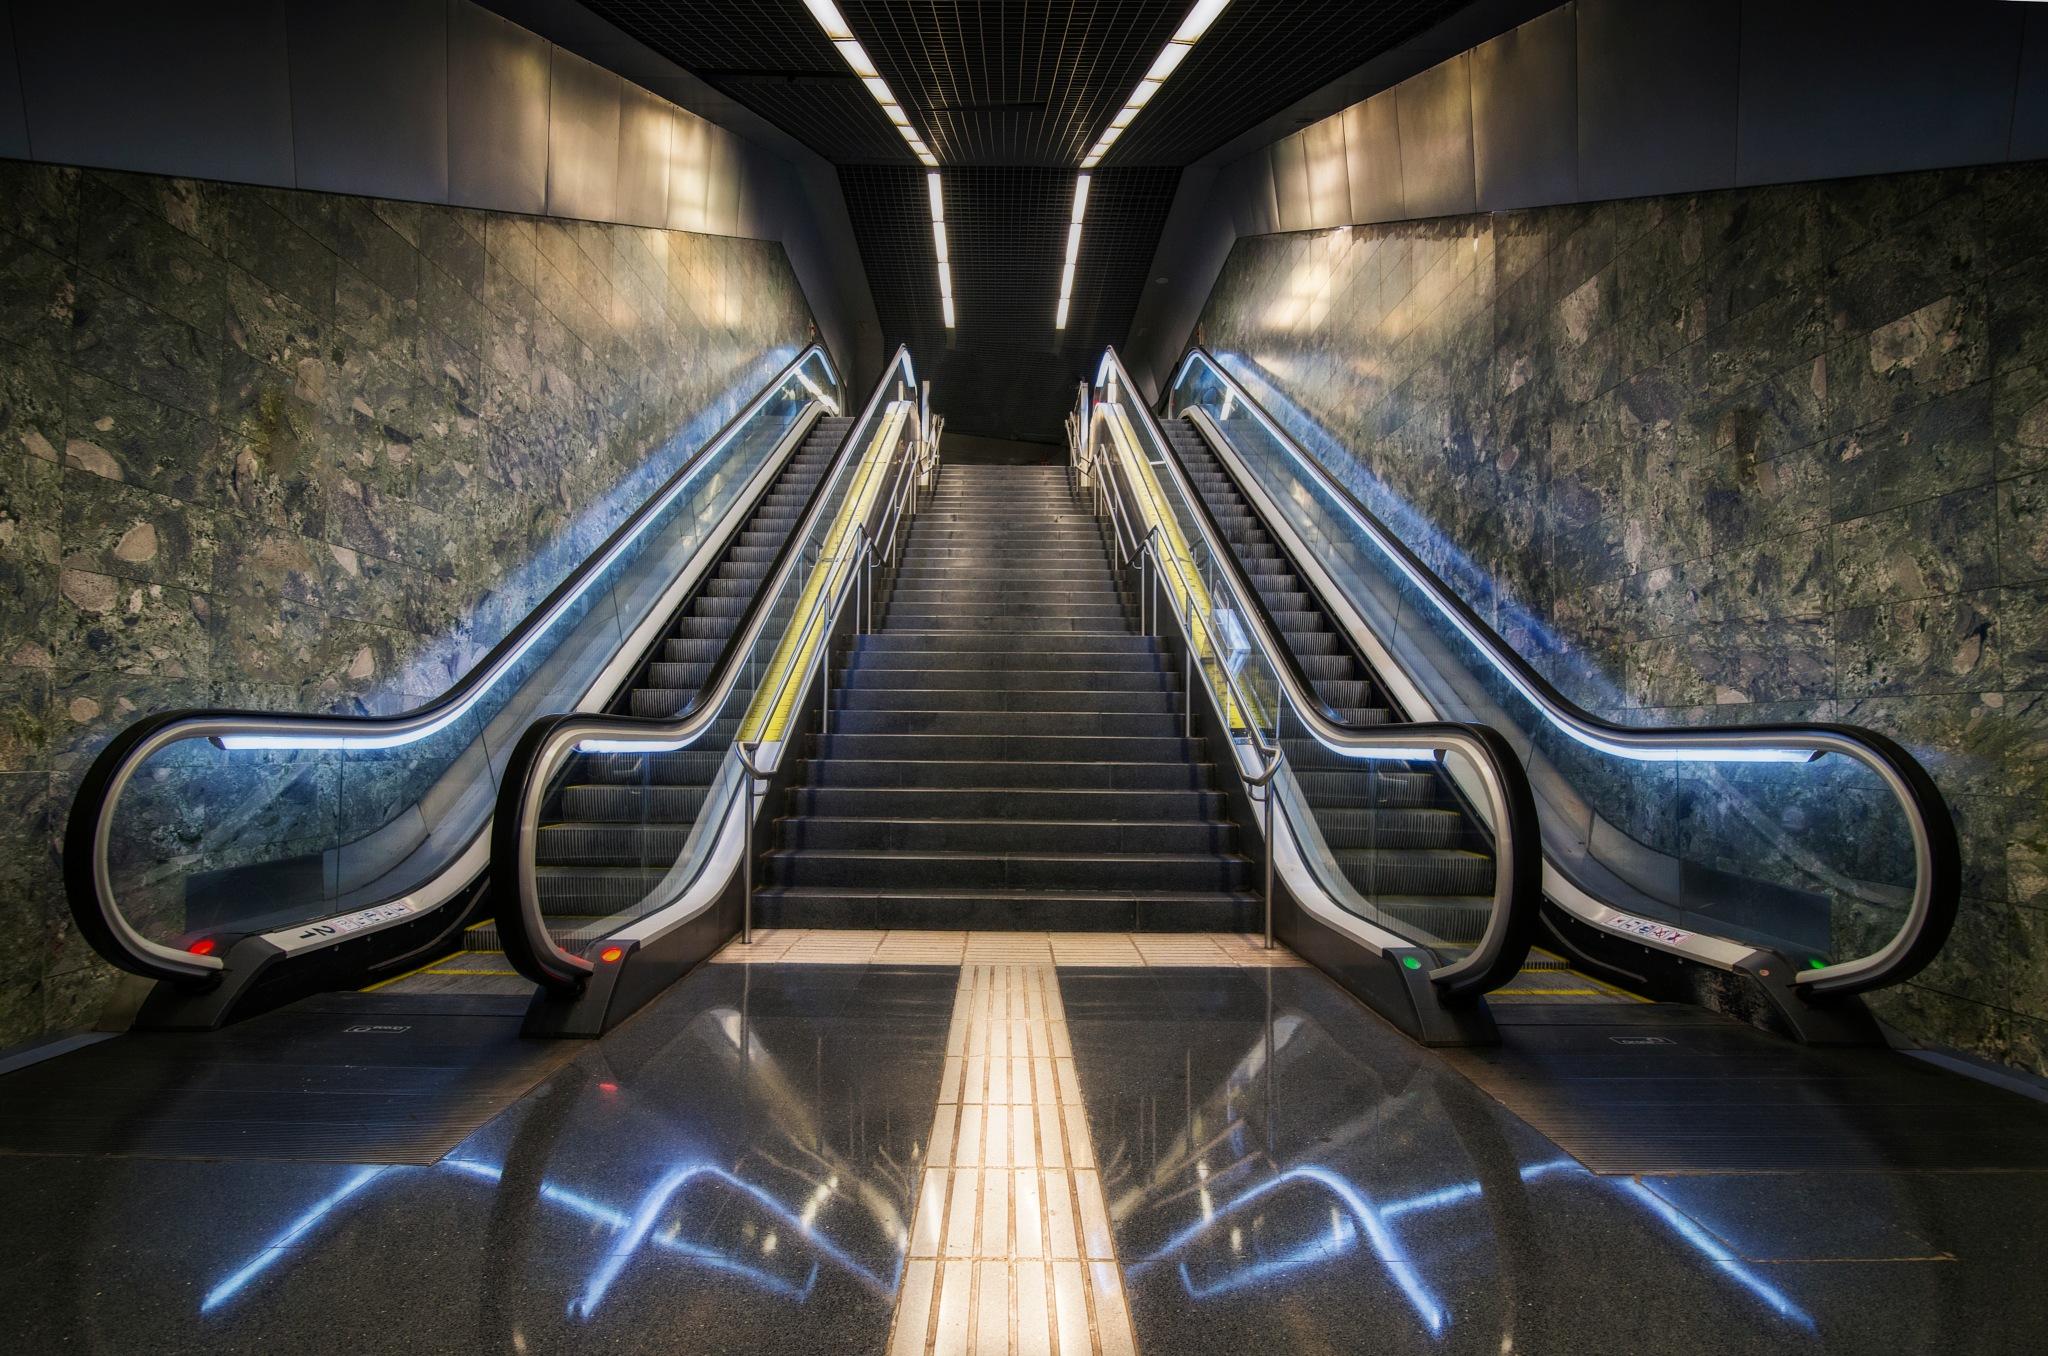 barcelona metro by Maurits De Groen